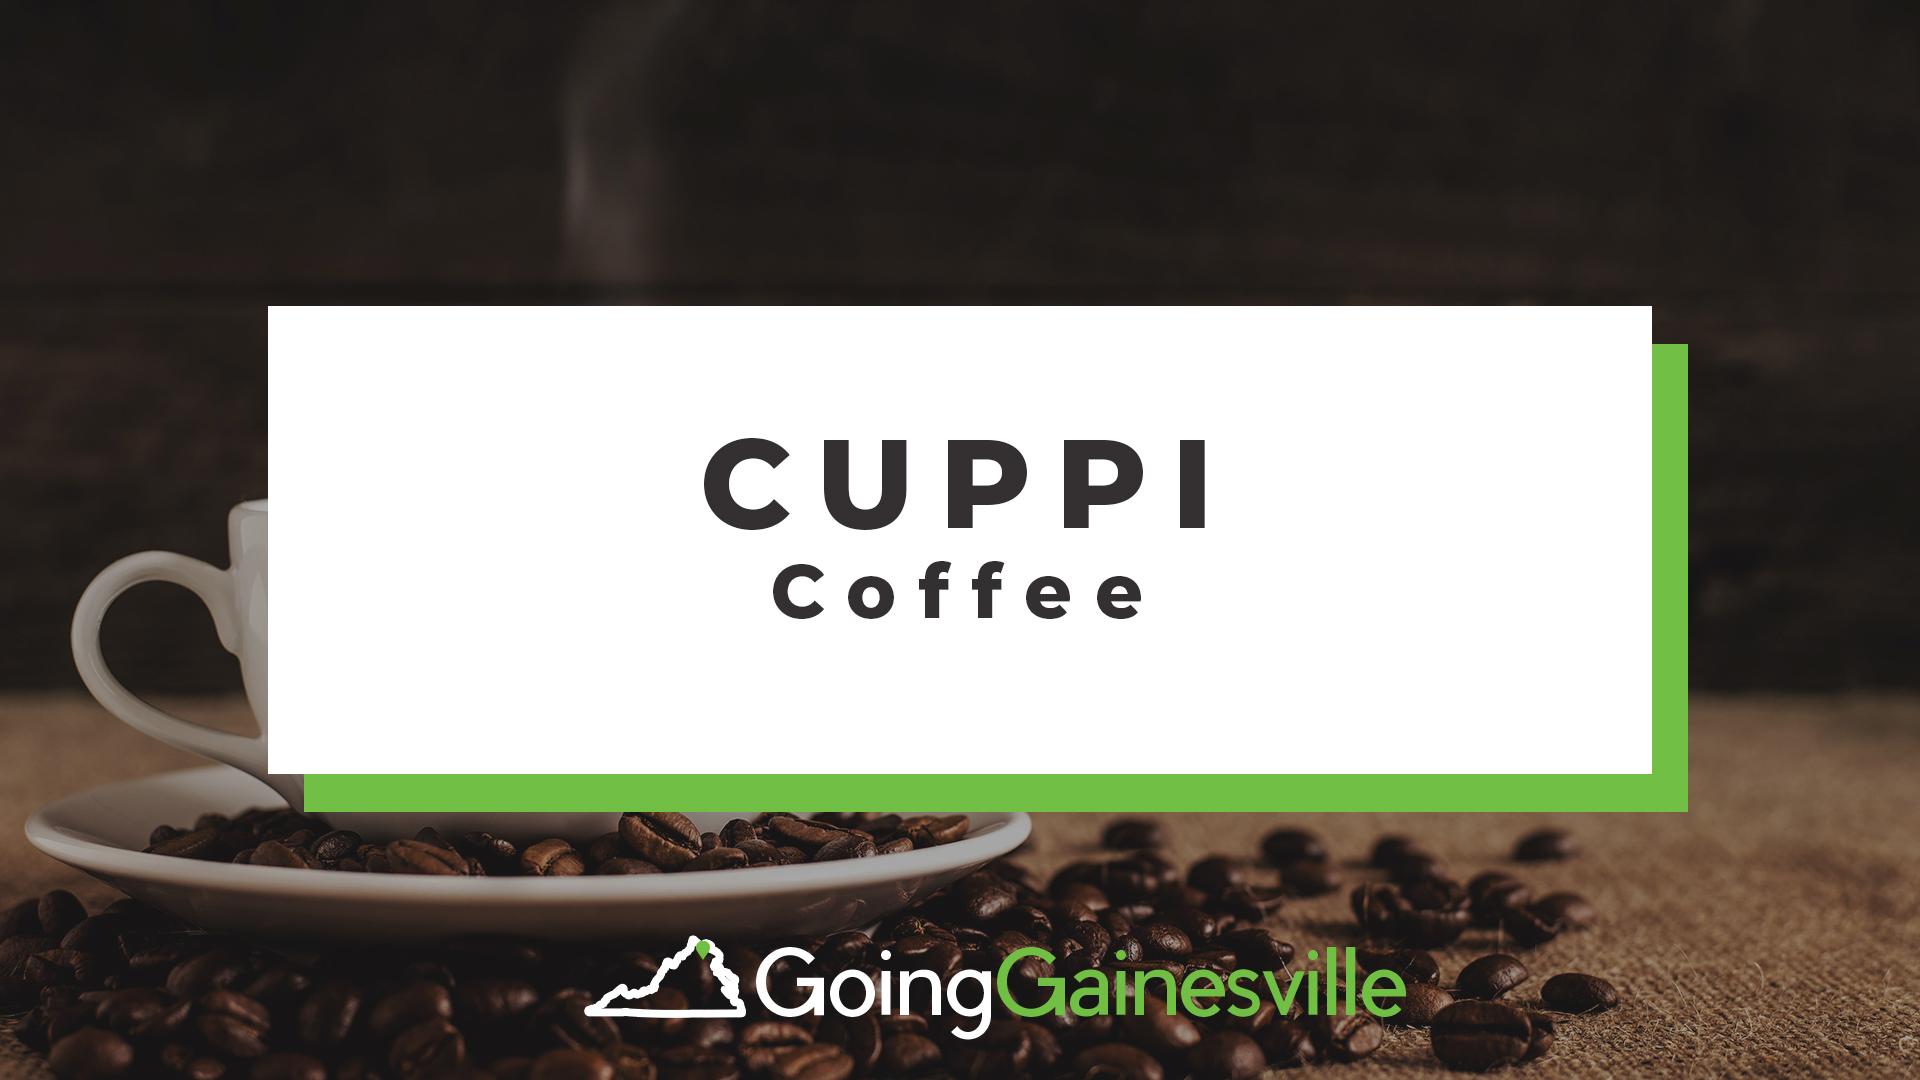 Cuppi Coffee